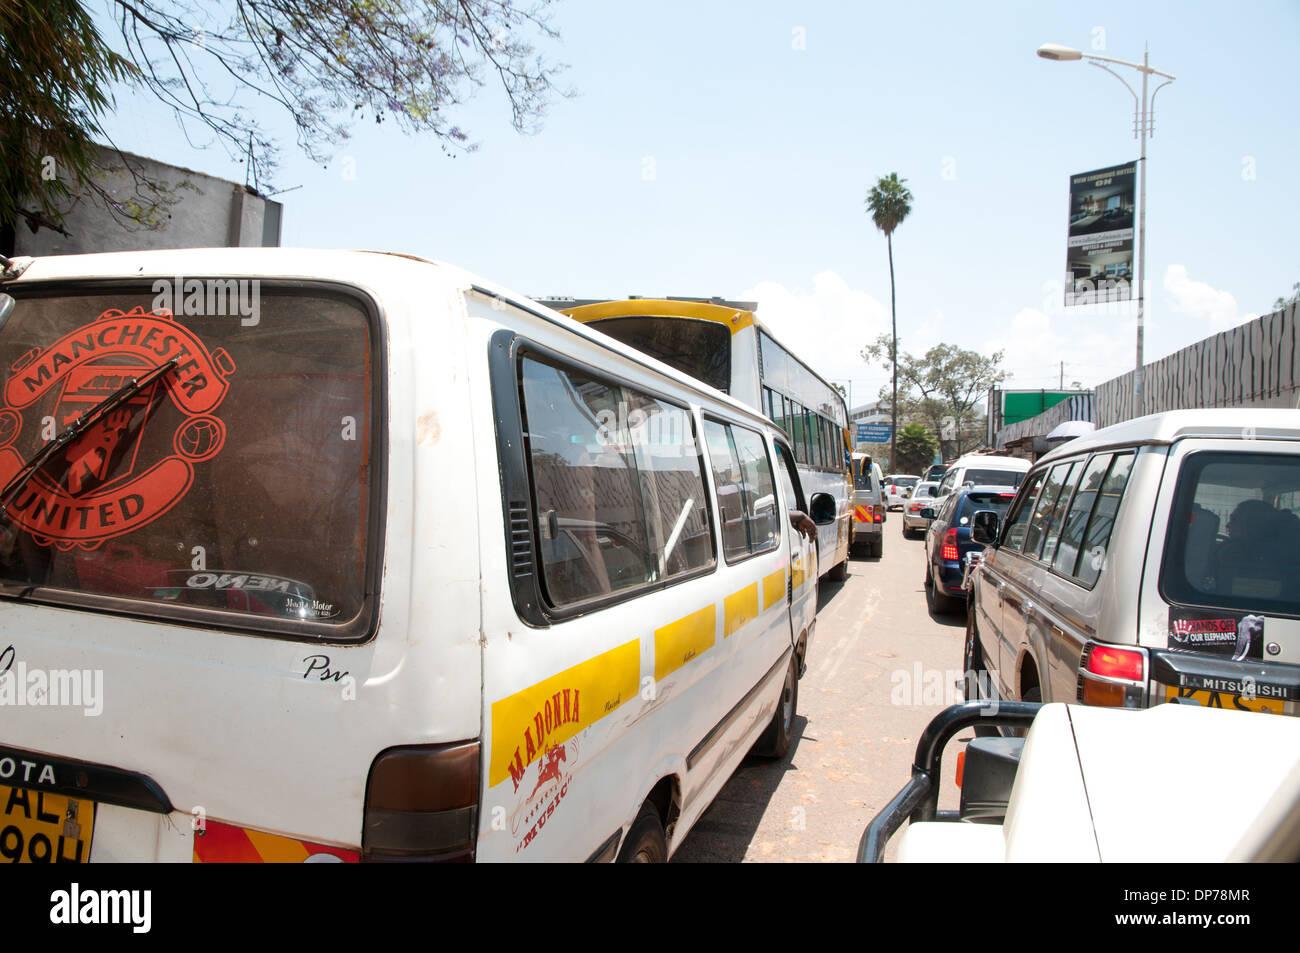 Traffic queue in Nairobi Kenya with Minibus matatu carrying logo for Manchester United in rear window - Stock Image